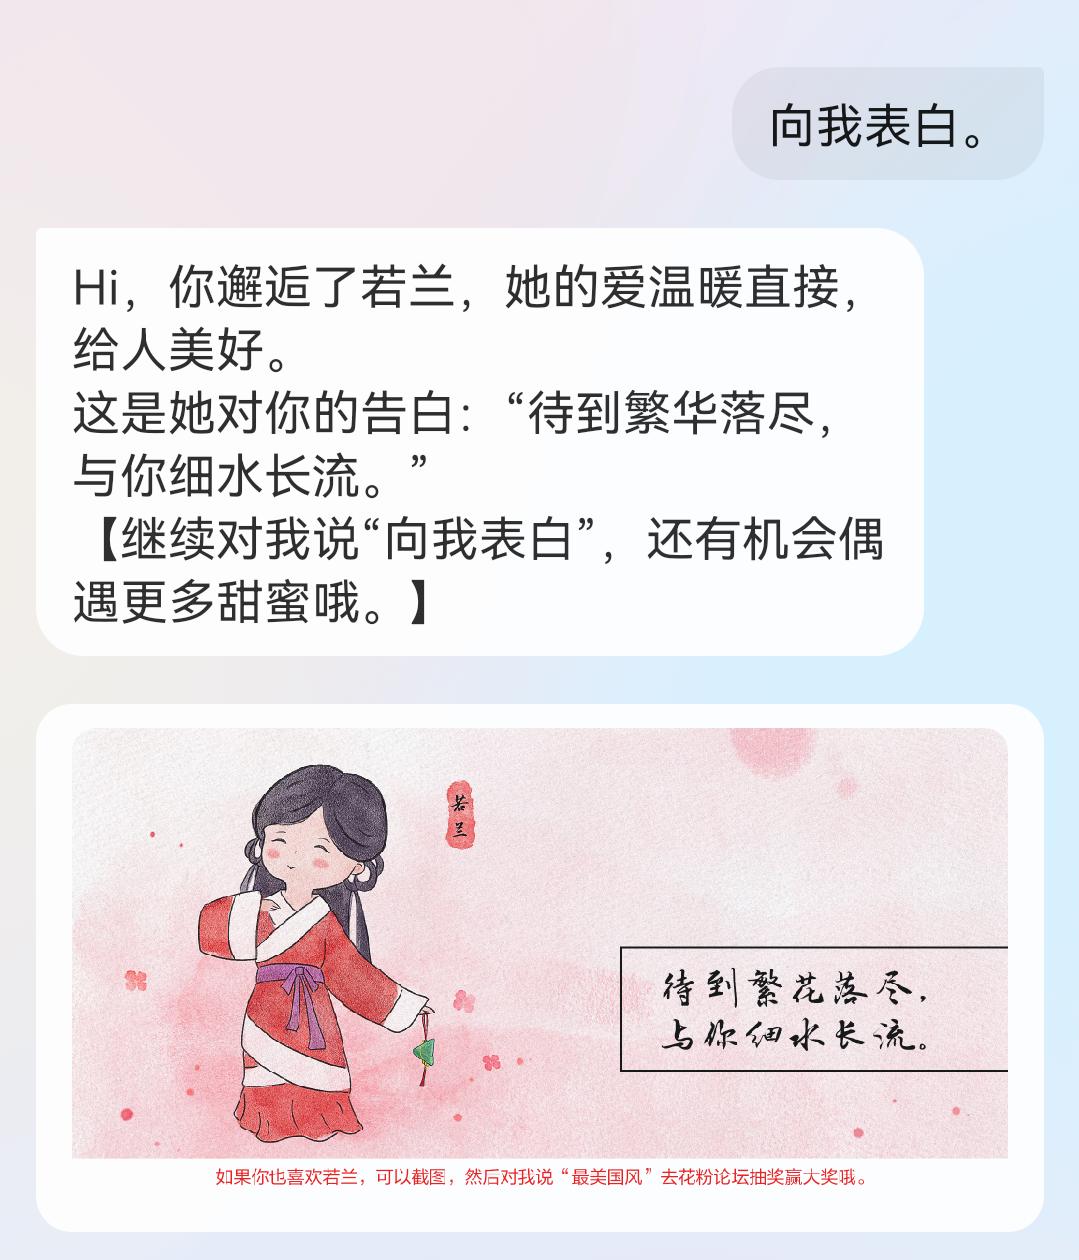 Screenshot_20210611_164858_com.huawei.vassistant.png